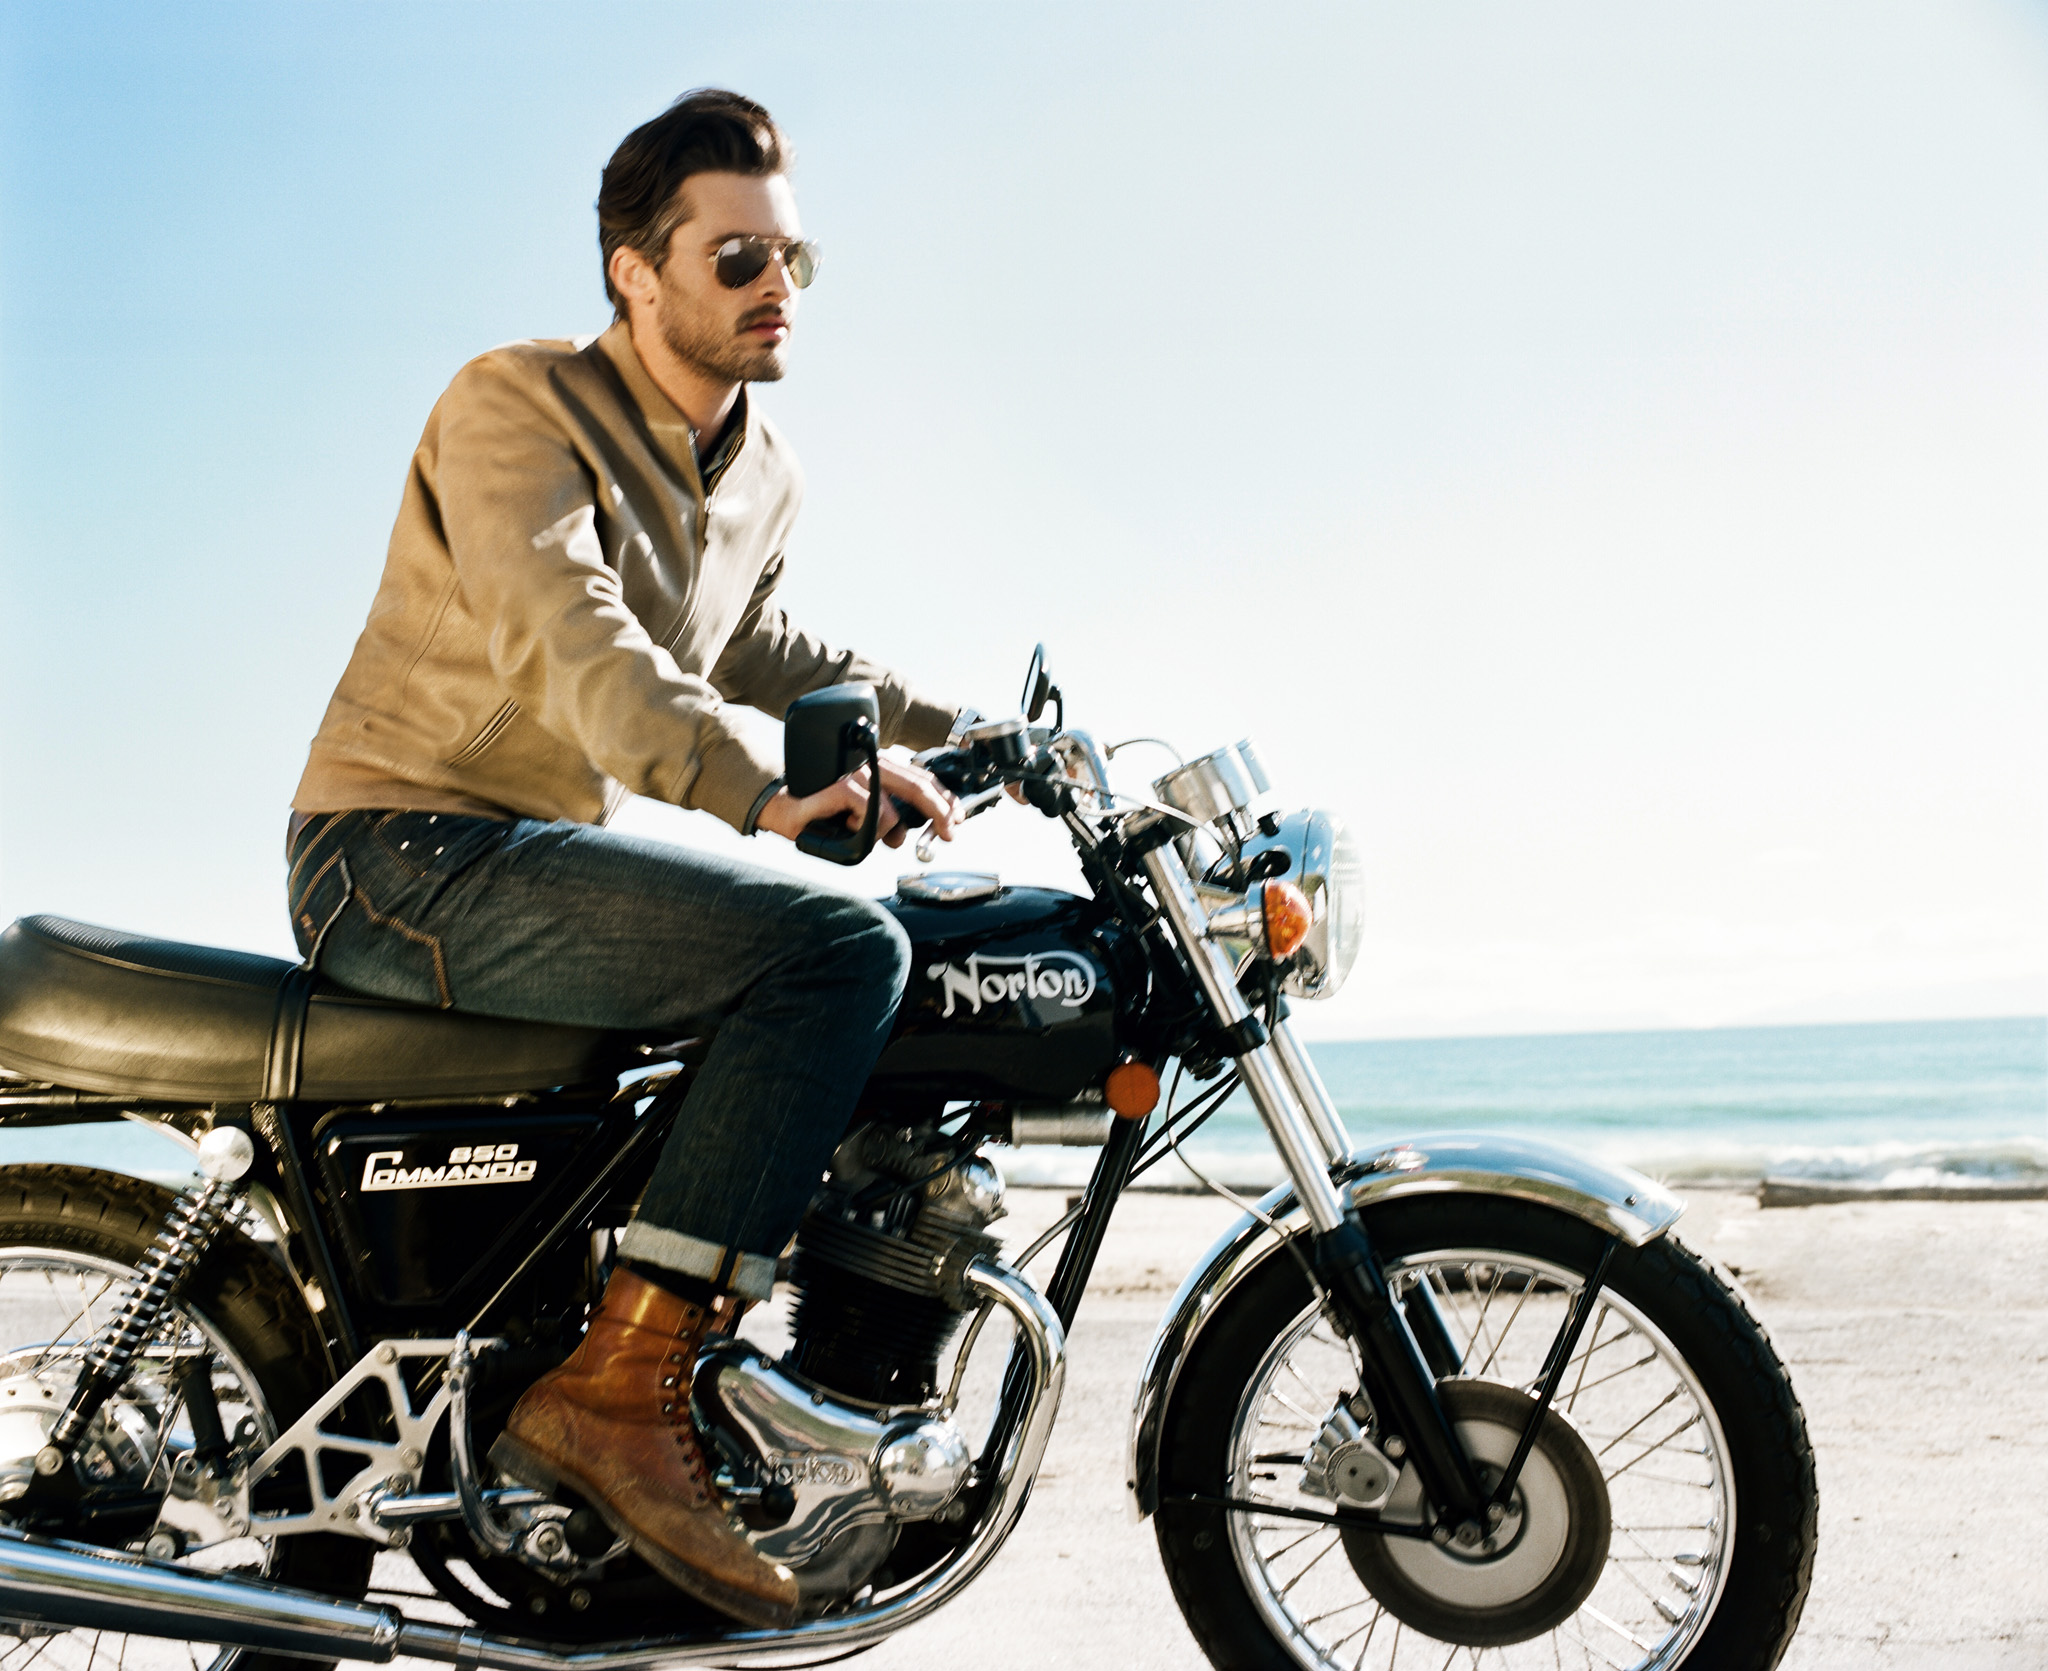 GQ China Motorcycle — DOUG INGLISH PHOTOGRAPHY